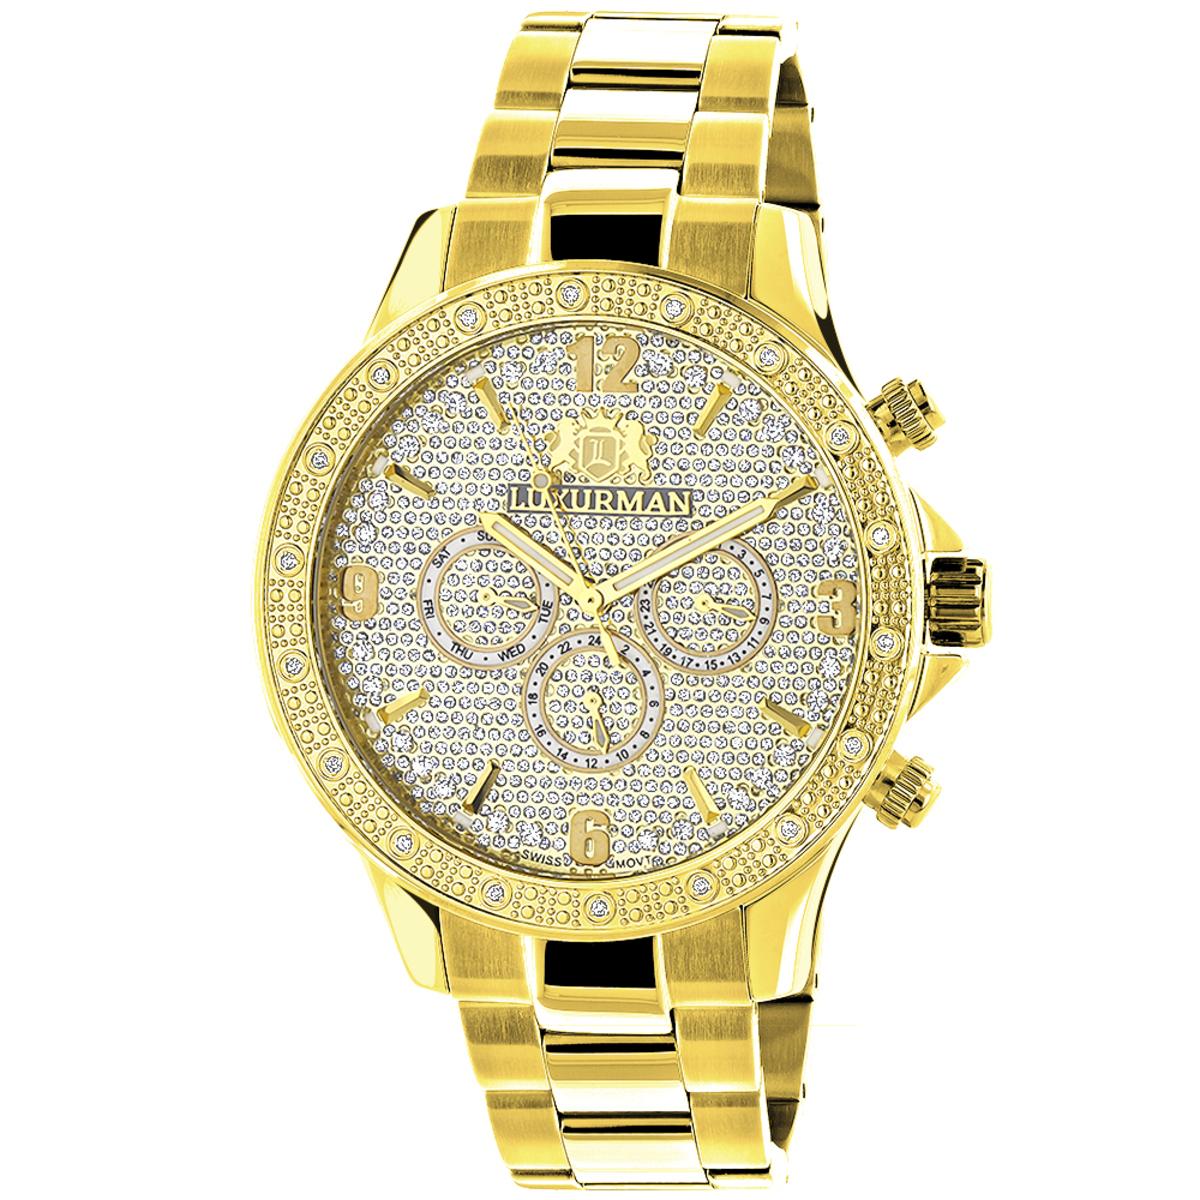 Luxurman Liberty Mens Diamond Watch for Sale 0.2ct Yellow Gold Plated Swiss